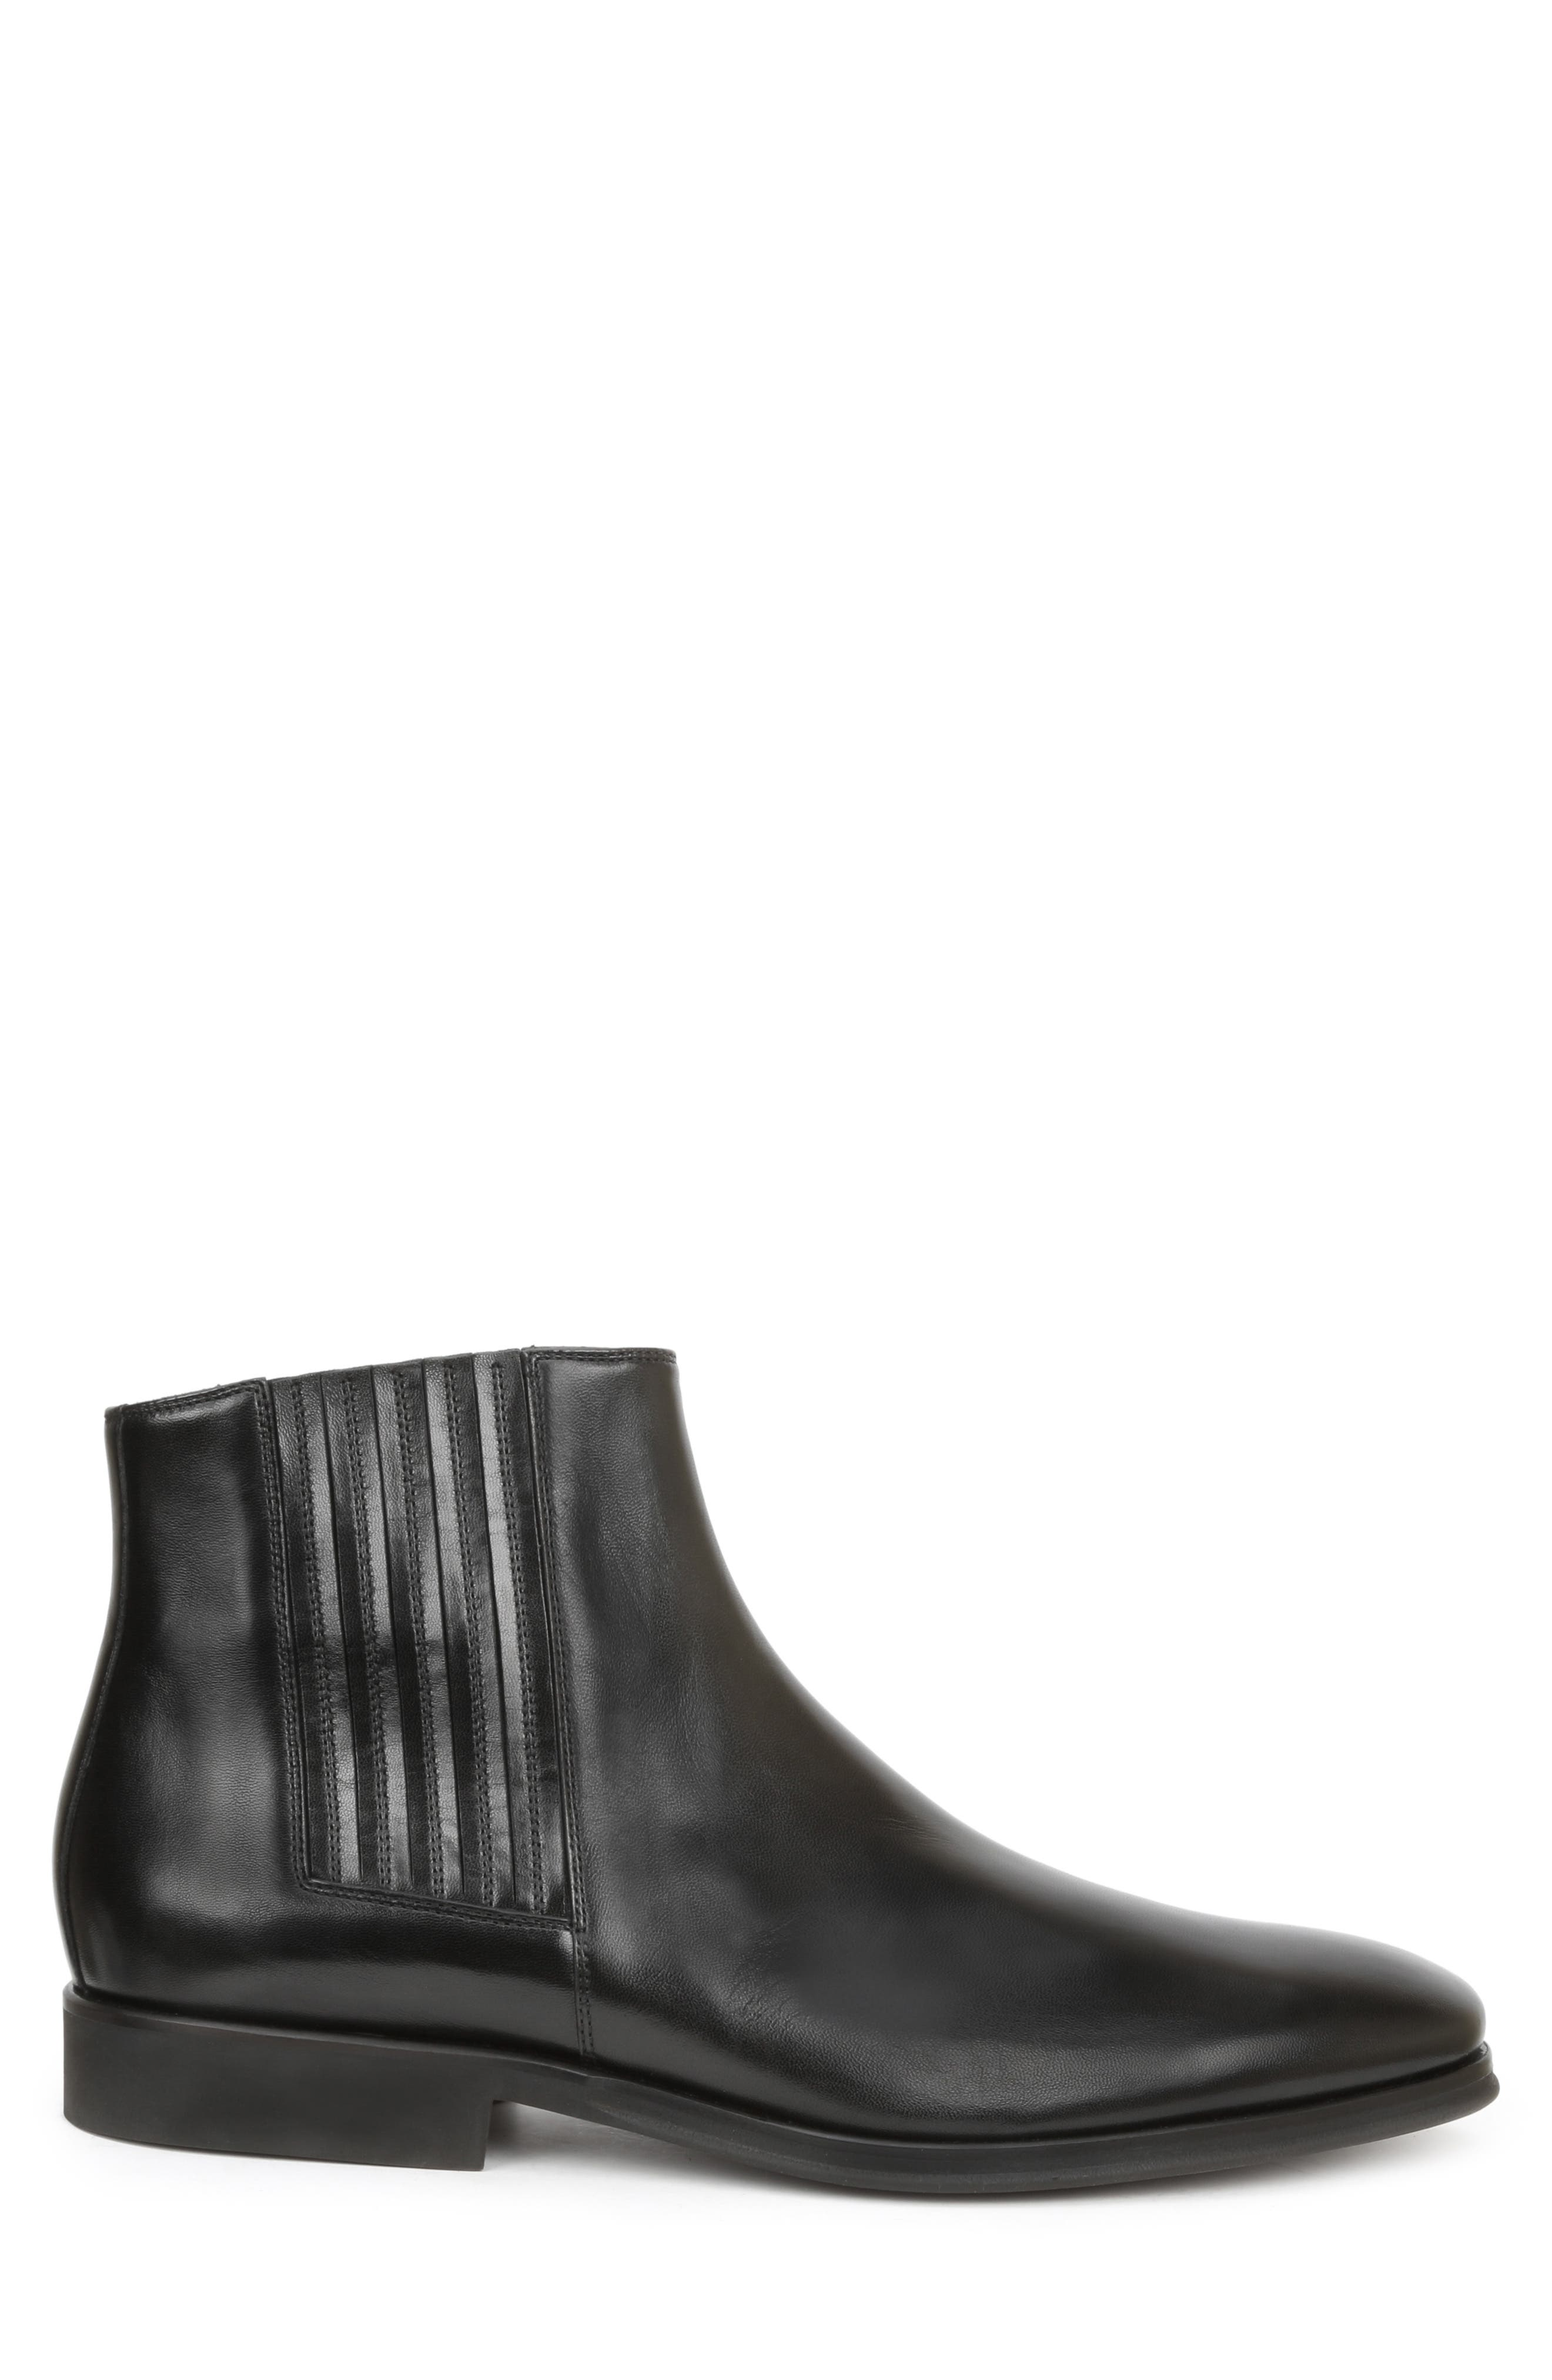 BRUNO MAGLI, Rezzo Chelsea Boot, Alternate thumbnail 3, color, BLACK